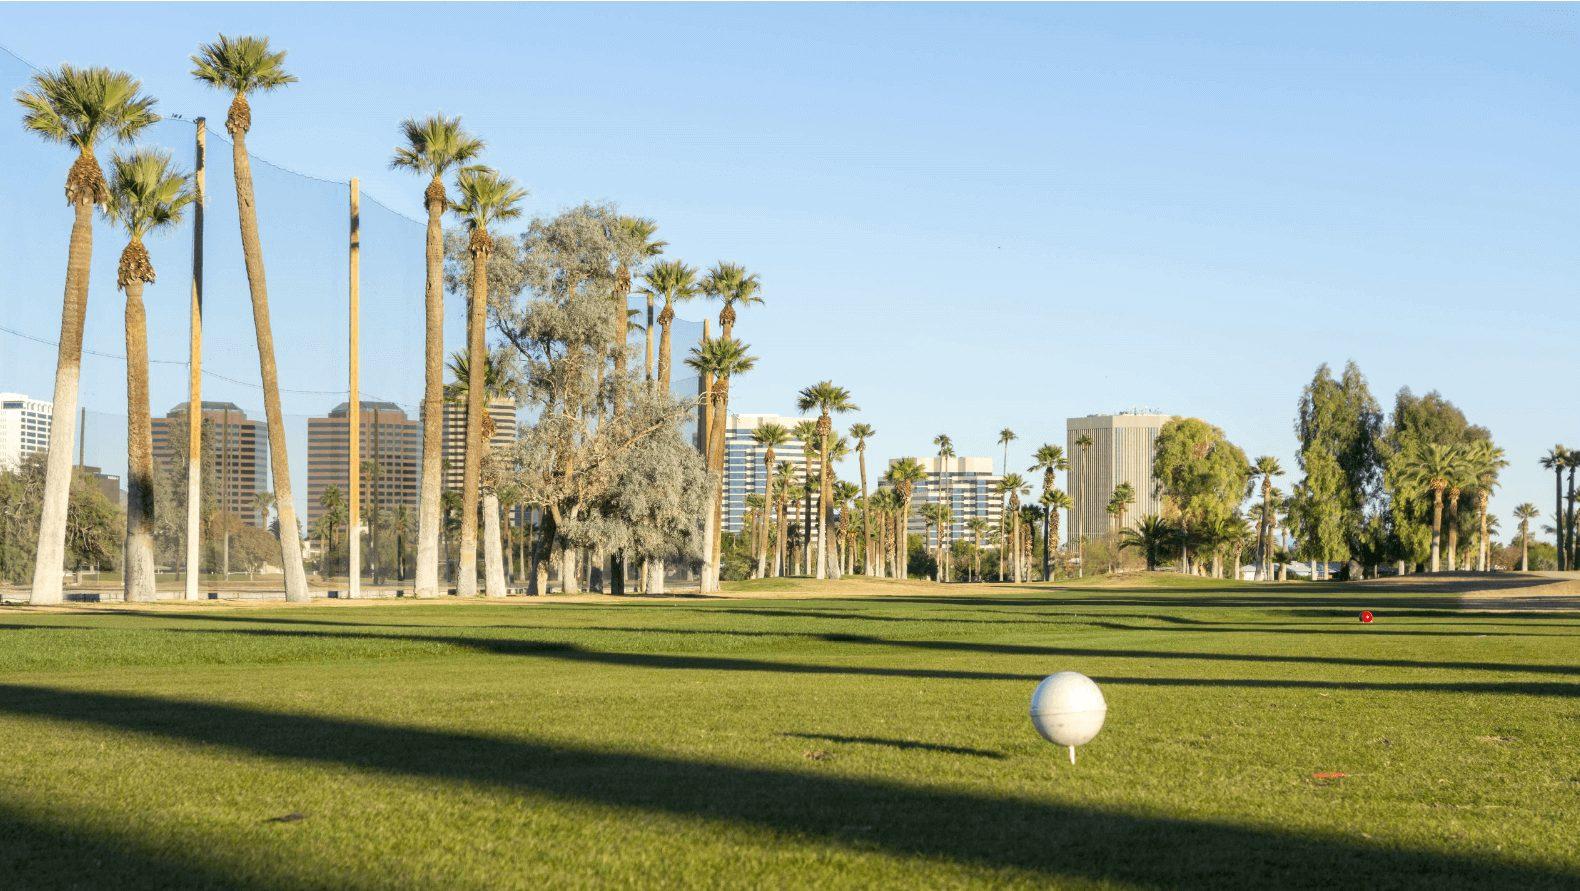 Golf Course Field, Encarto Park Phoenix Arizona